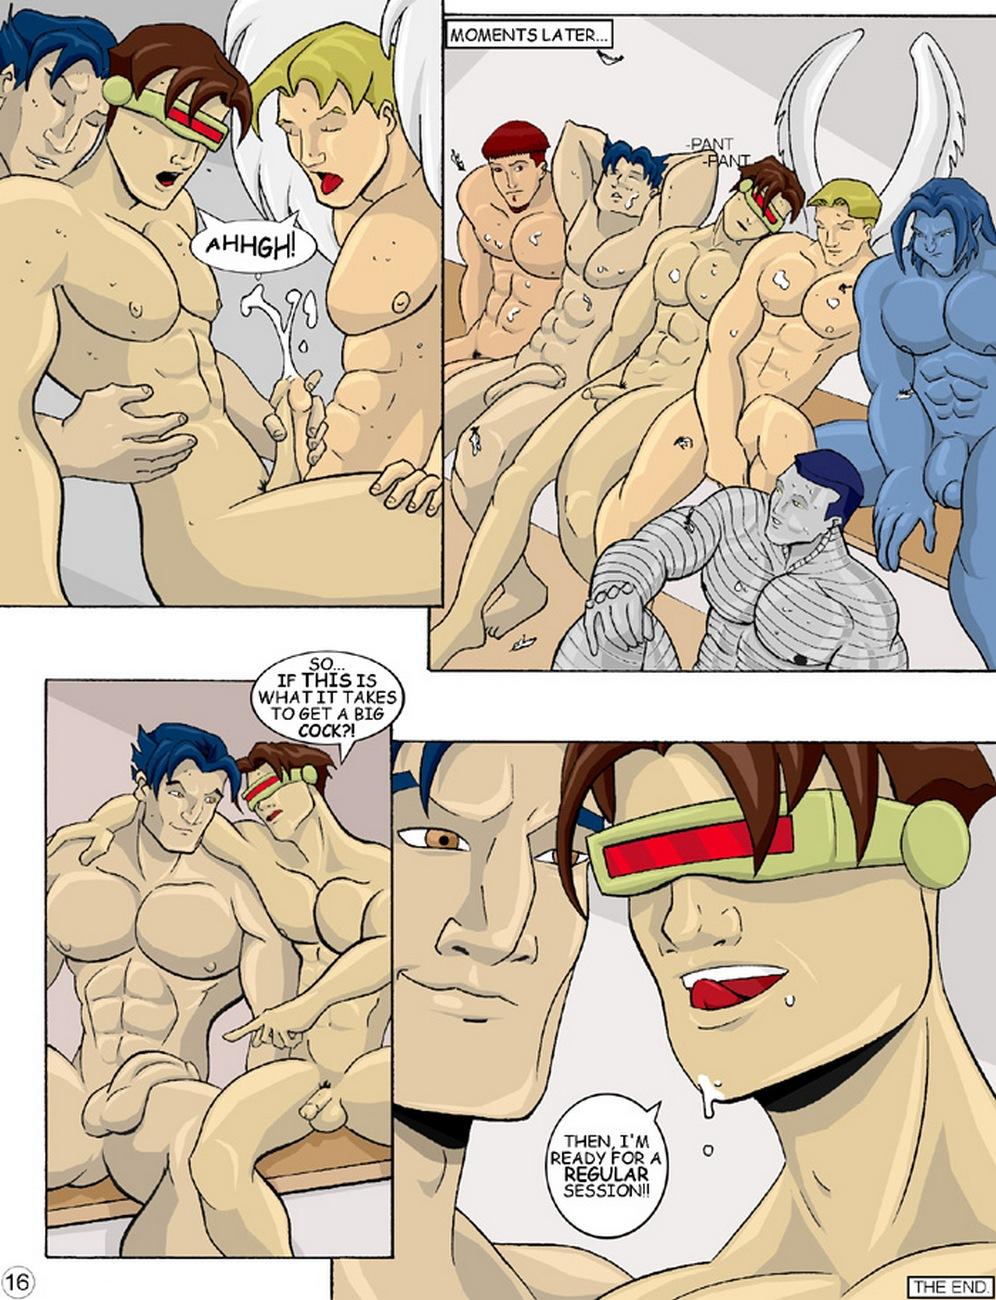 gey-porno-marvel